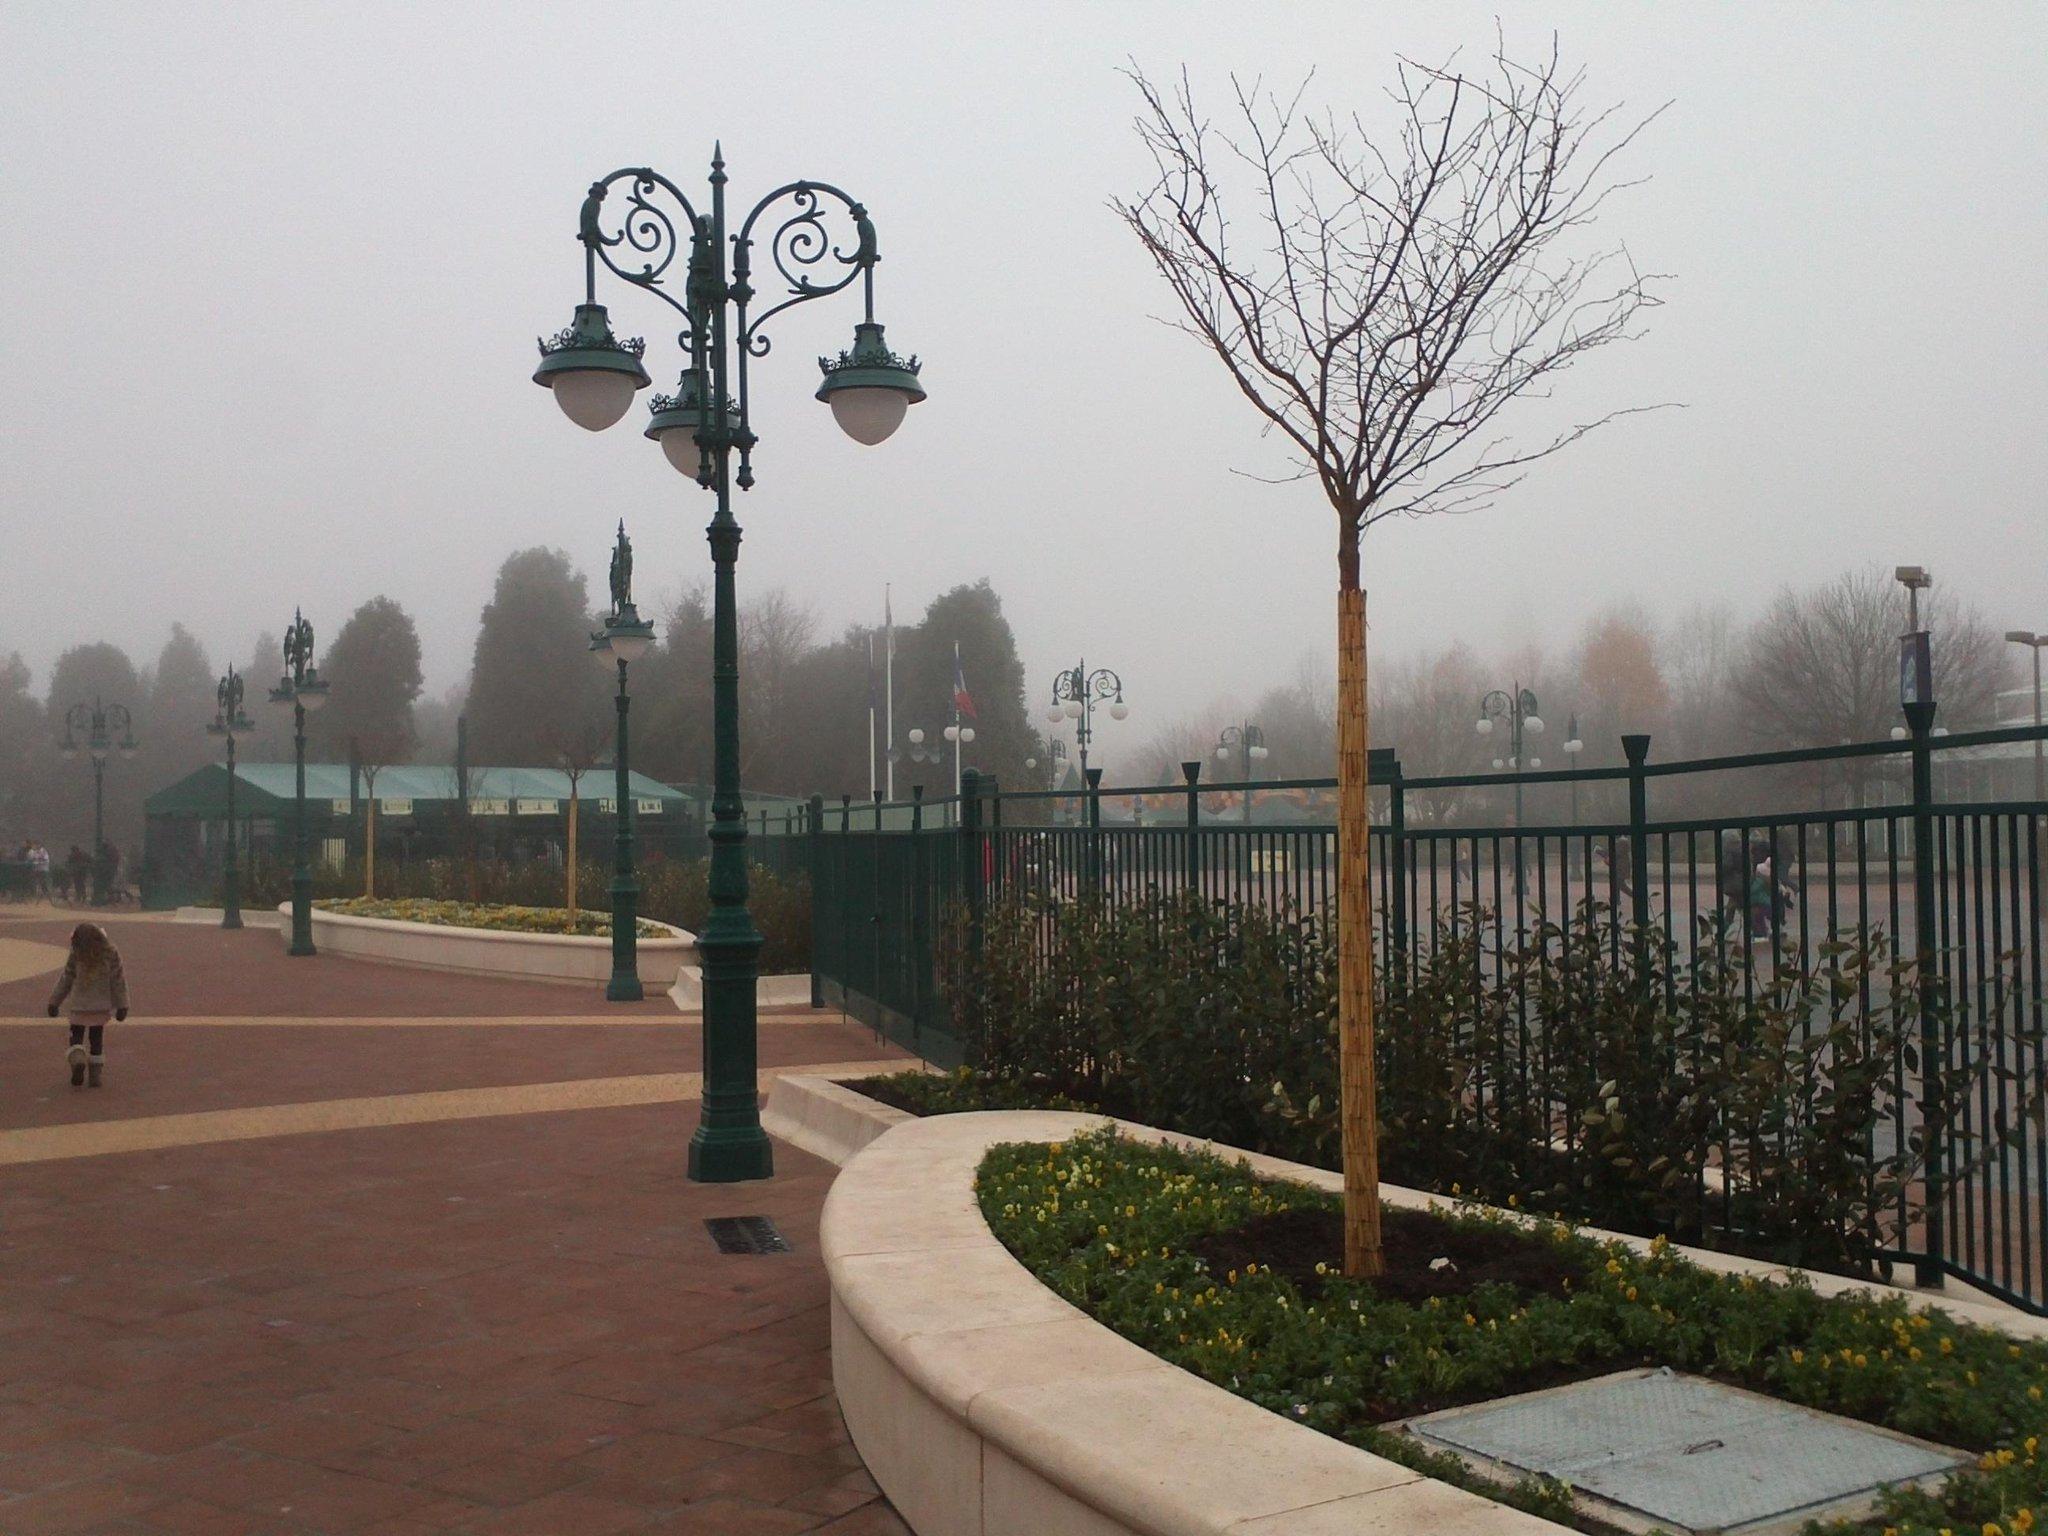 [Disney Village] Boutique World of Disney (12 juillet 2012) - Page 42 A88F_3RCUAAdJ0K